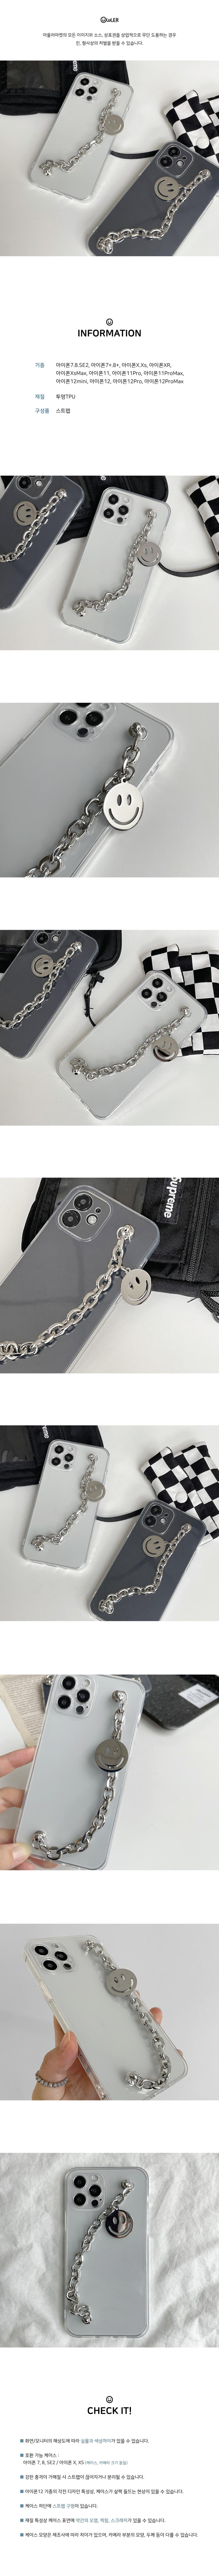 Smile Silver Chain Strap iPhone Case